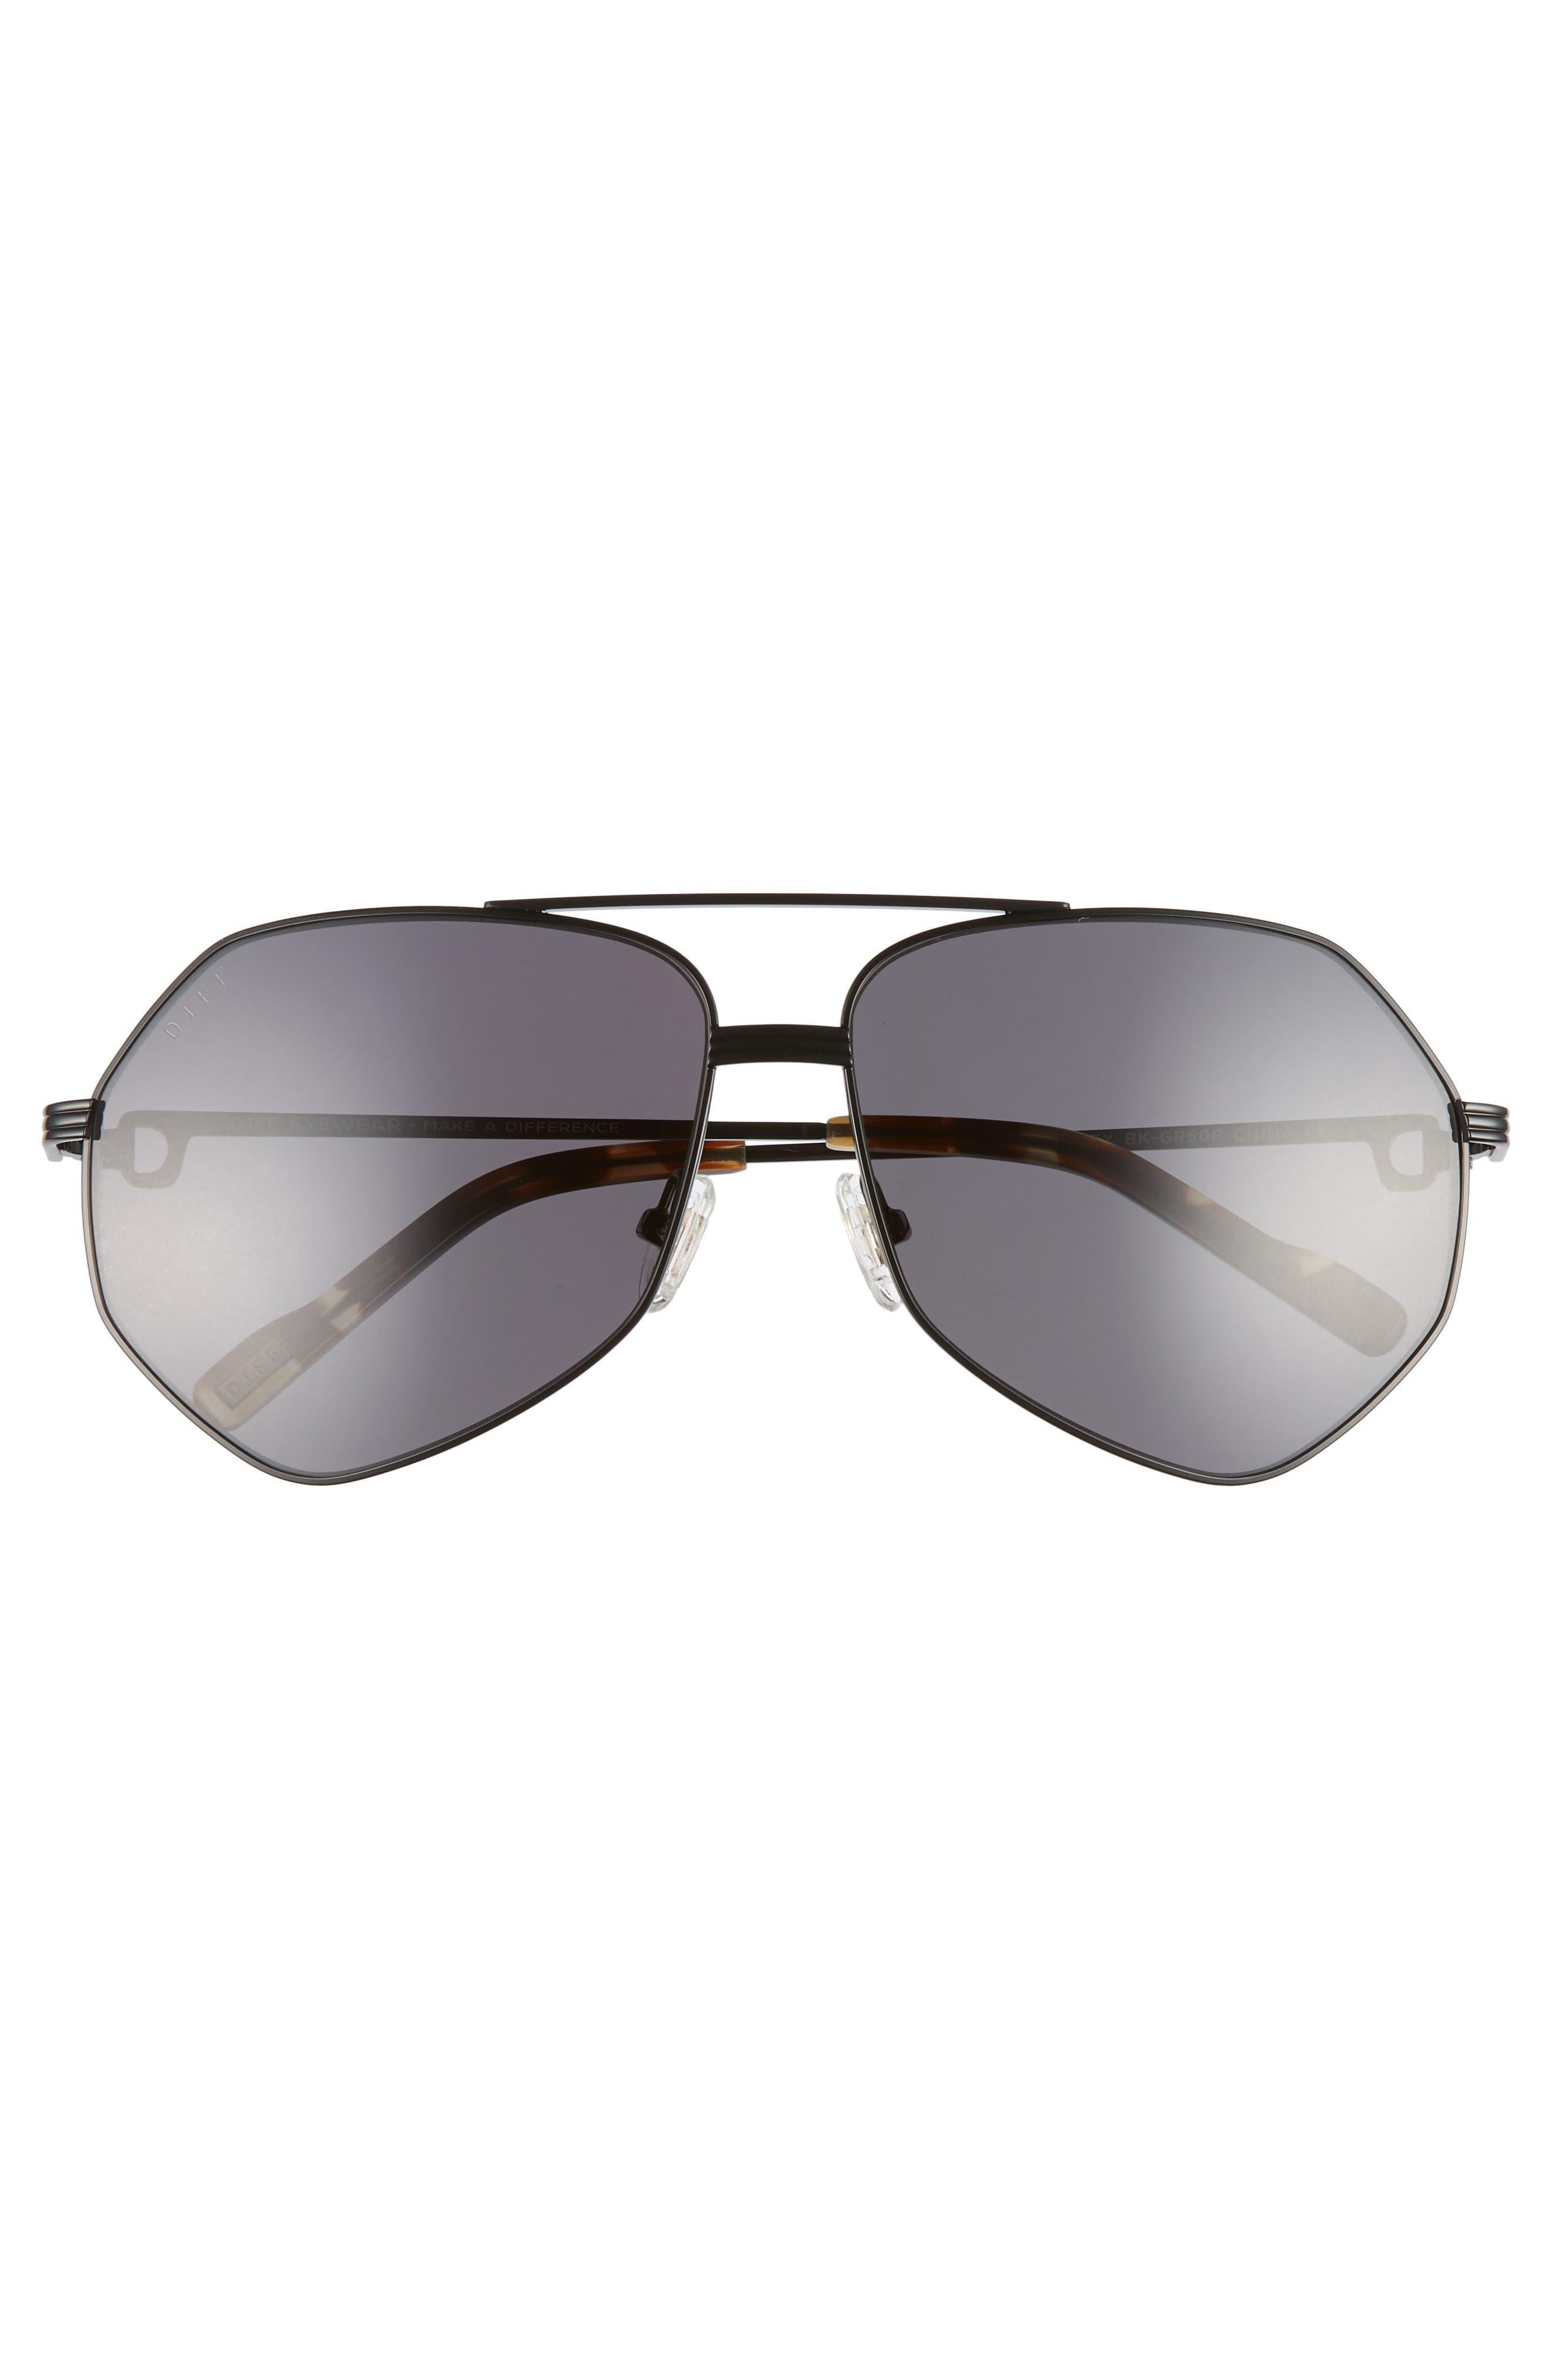 Sydney 62mm Polarized Aviator Sunglasses,                             Alternate thumbnail 3, color,                             BLACK/ MOSS HAVANA/ GREY